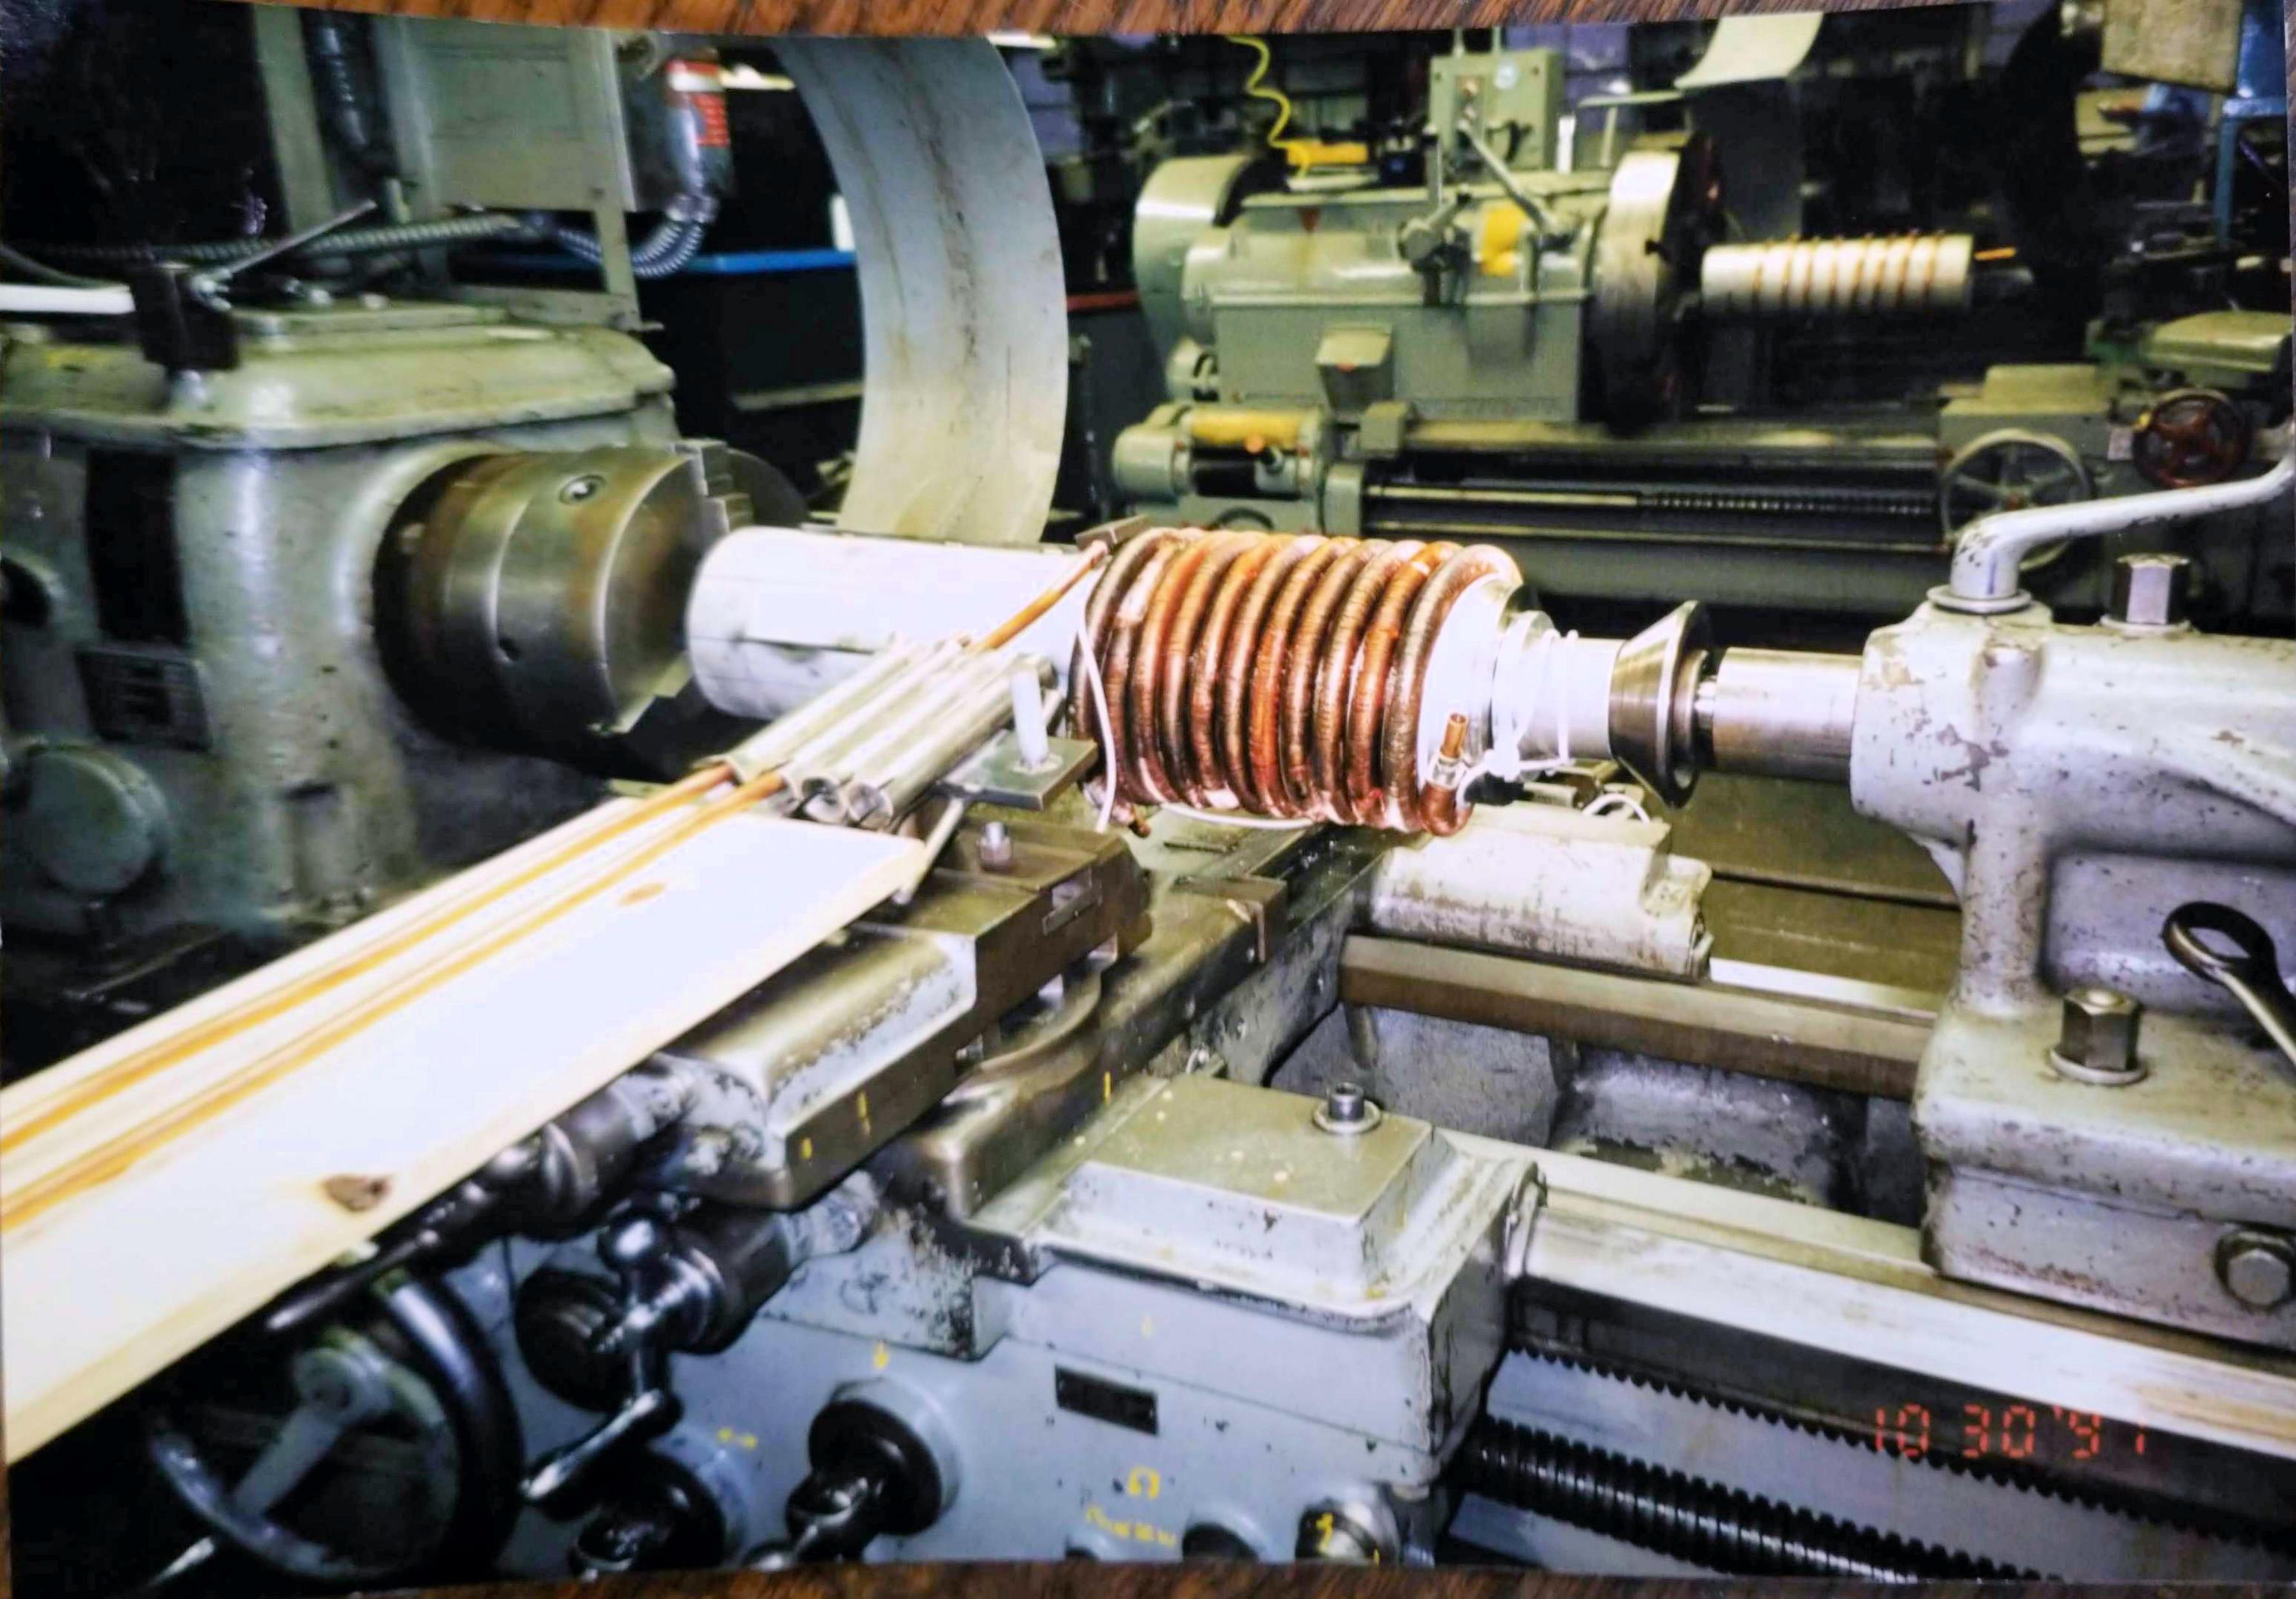 coiling_finned_tubing_-_machine_shop.jpg